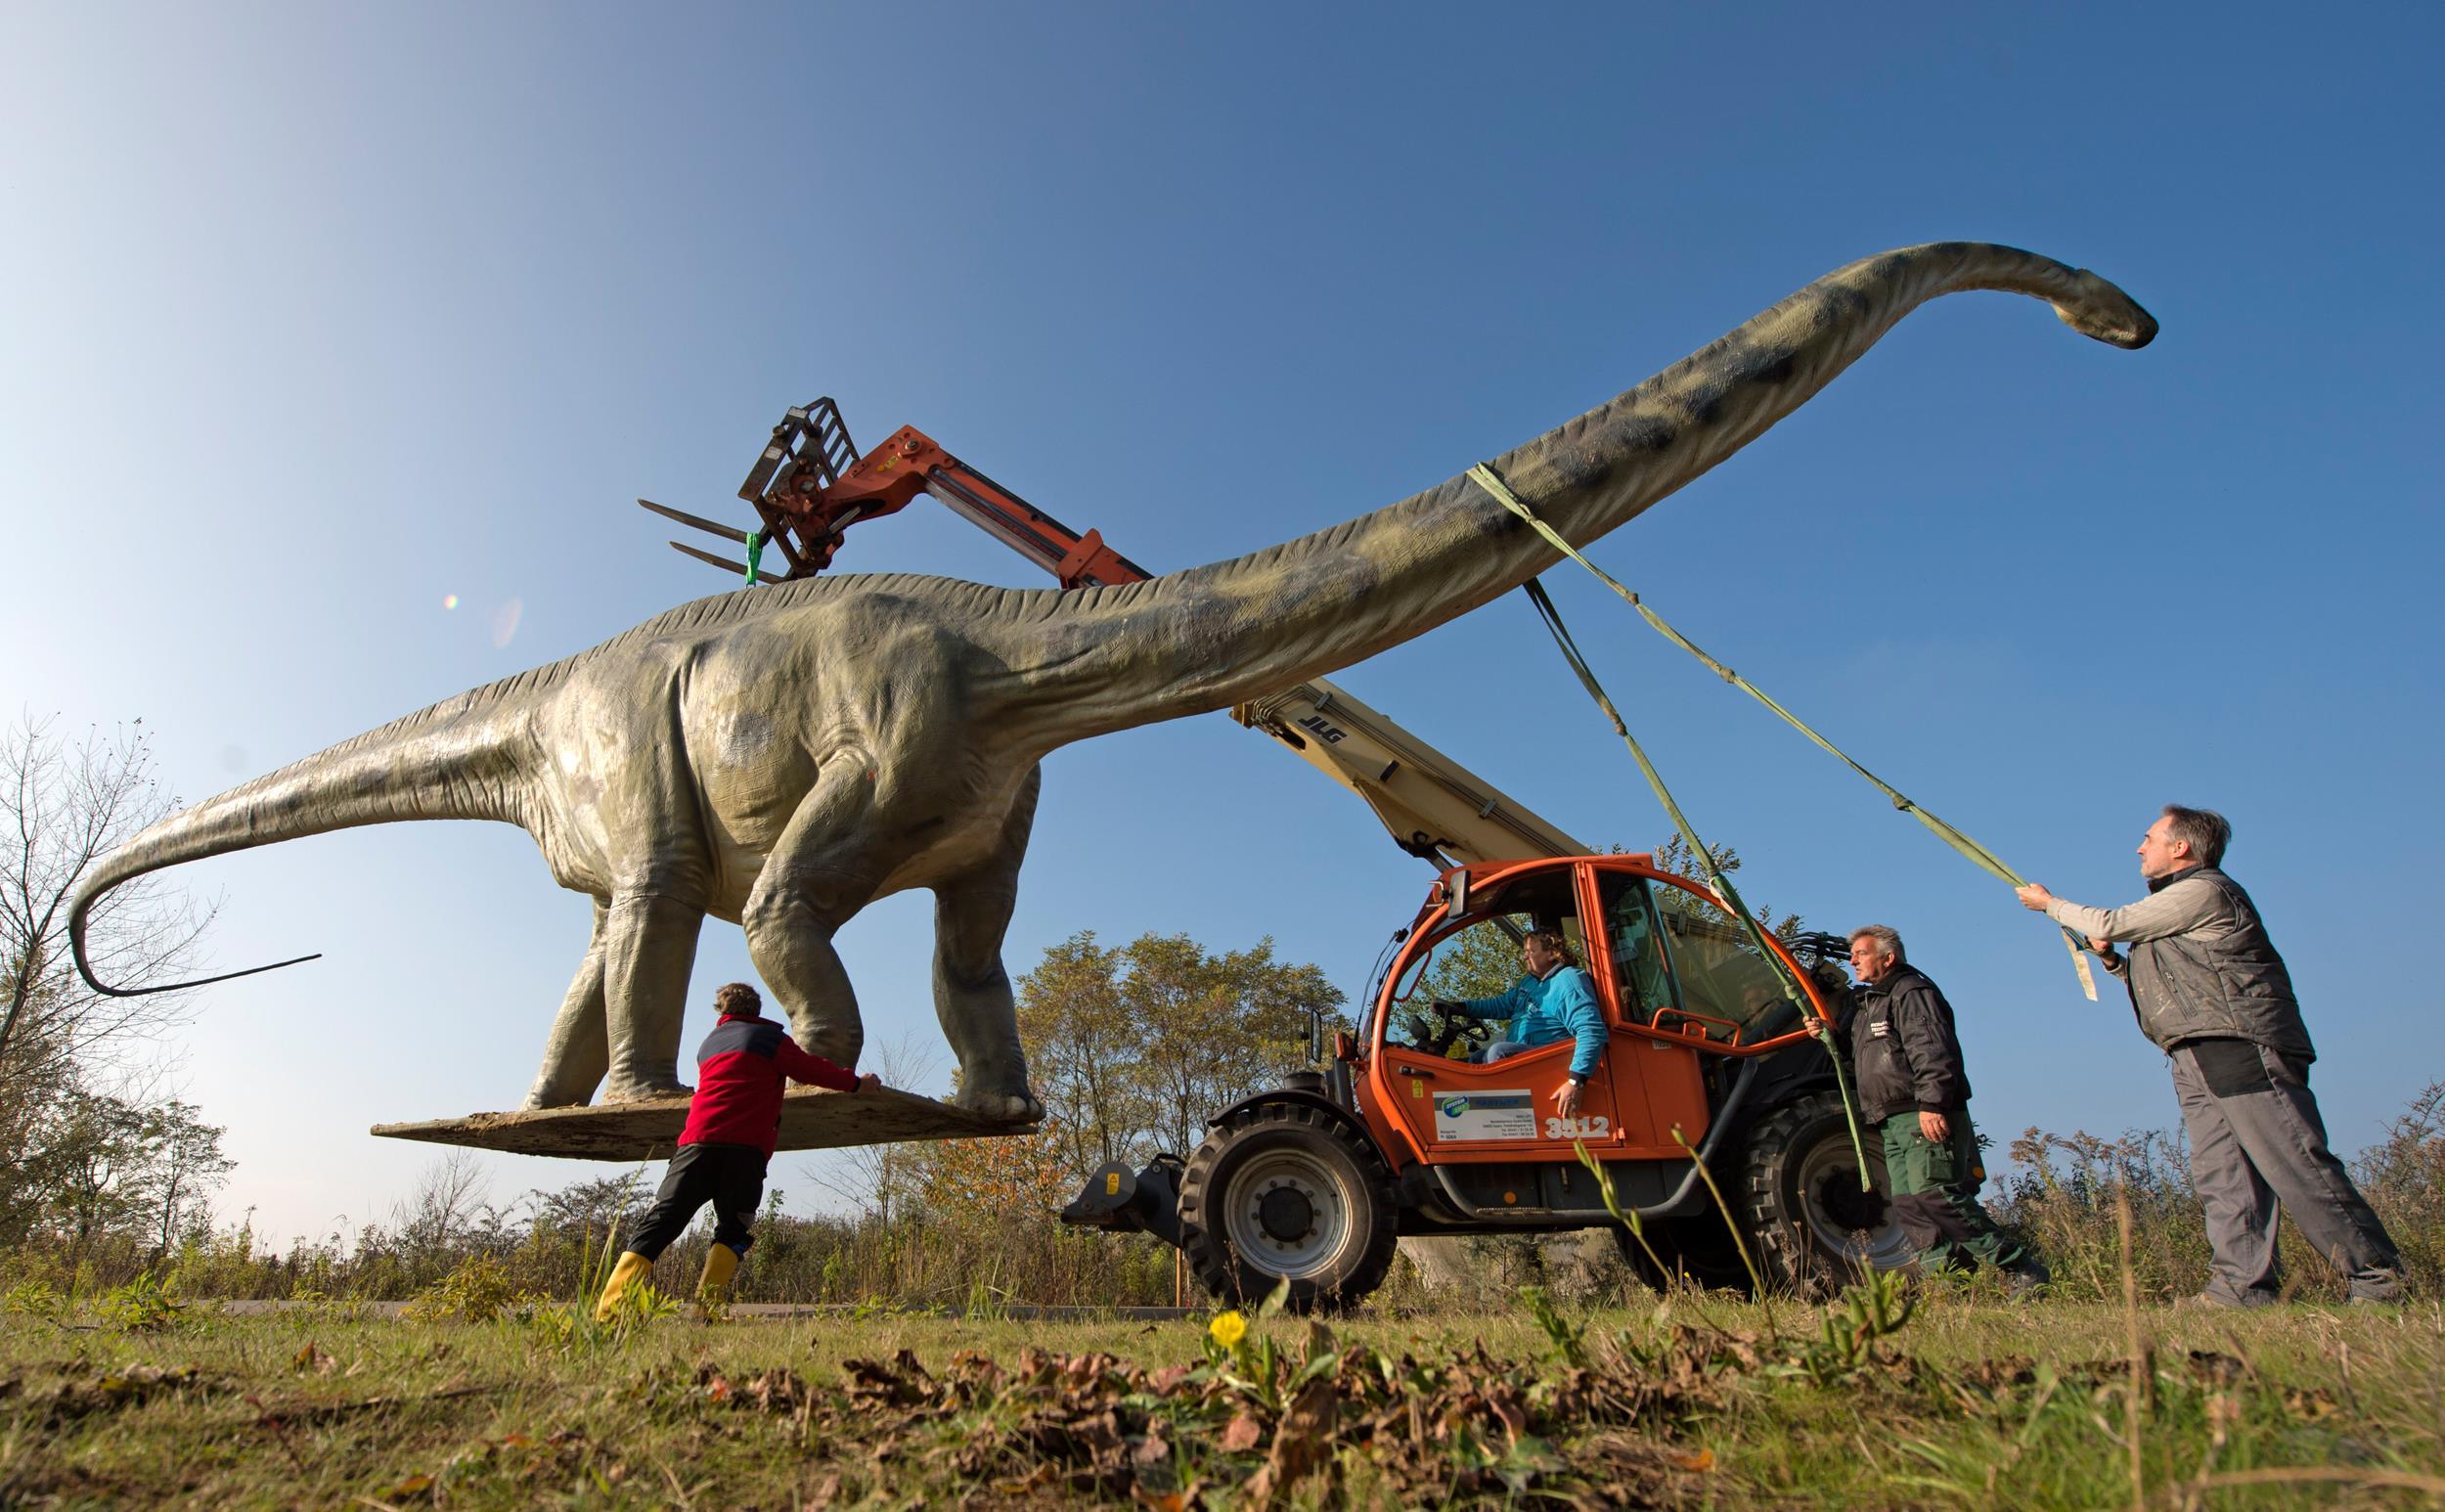 Distract-osaurus? Giant Statue Causes Traffic Headache